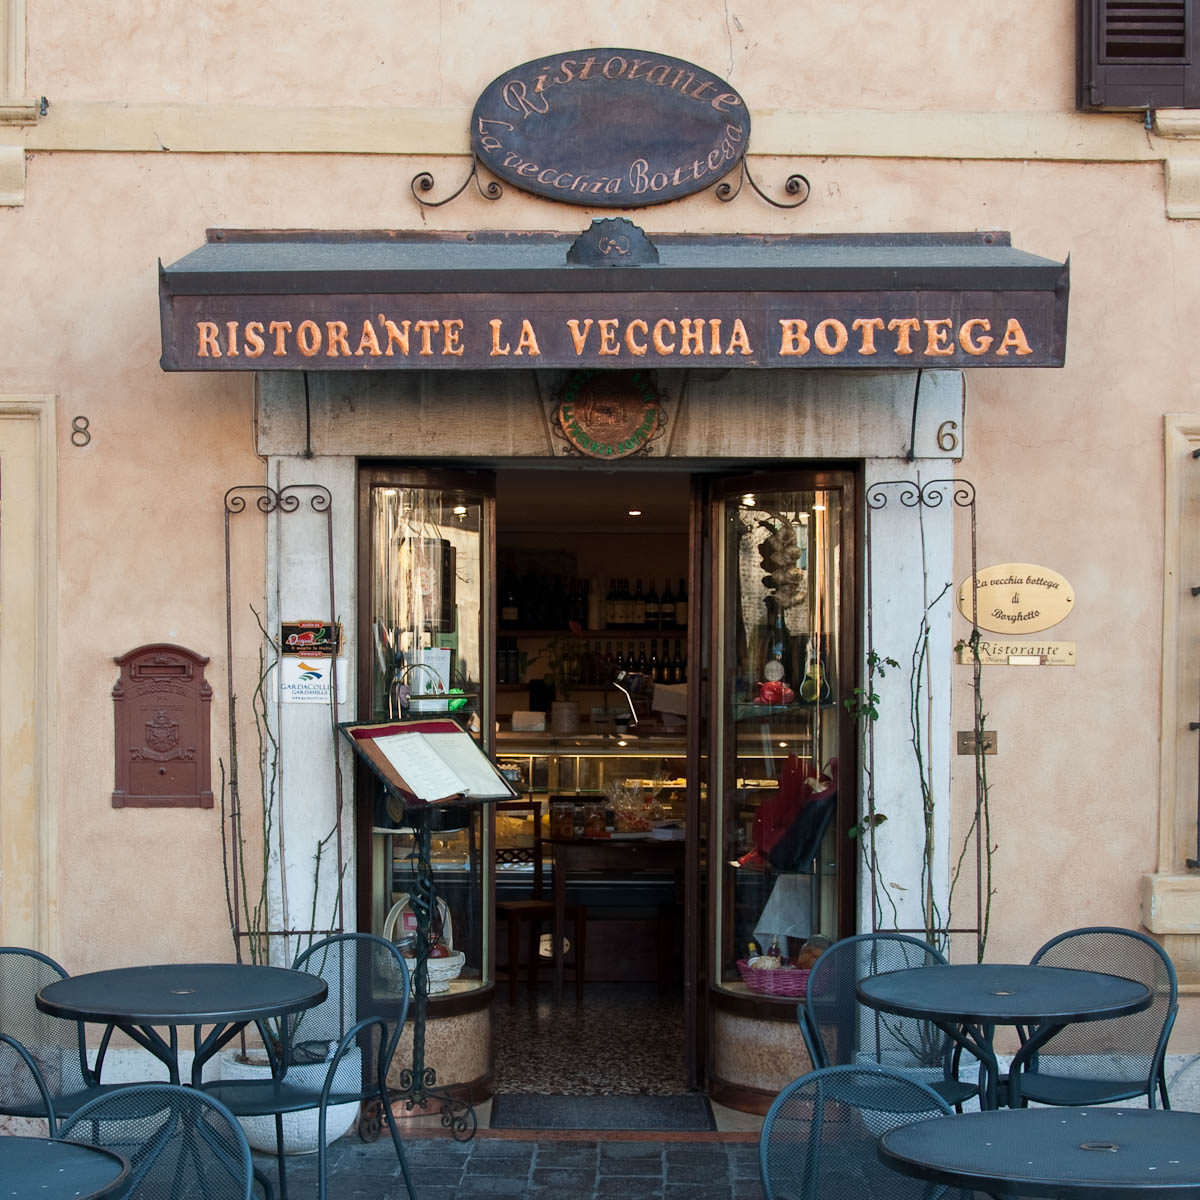 Restaurant, Borghetto, Veneto, Italy